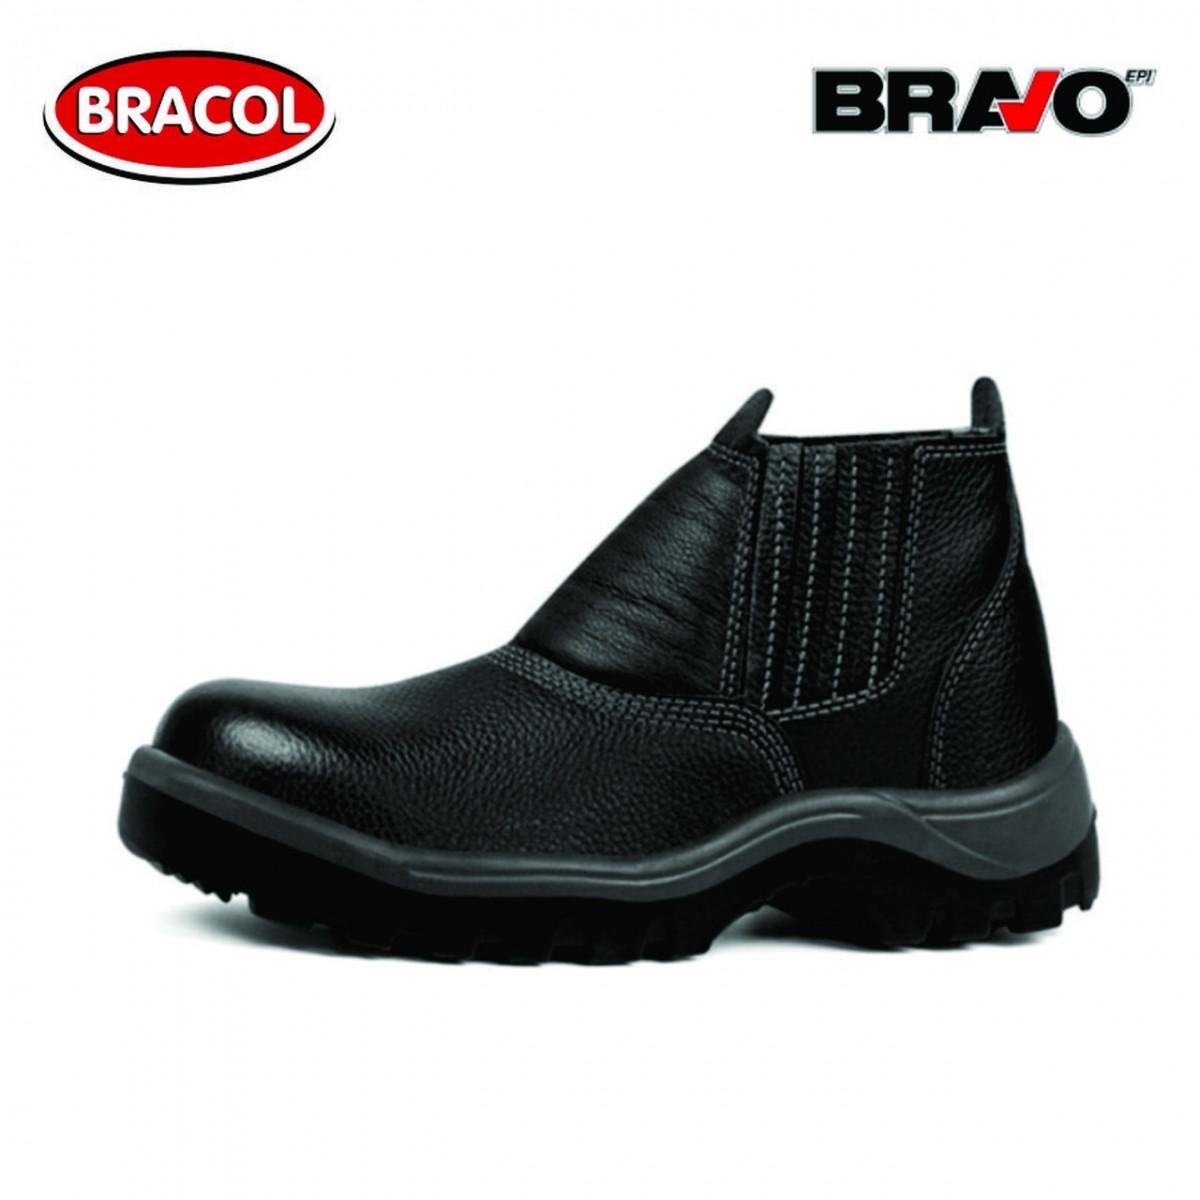 4112ac46d Botina Elástica Bravo - Bracol - NormasBR EPI's